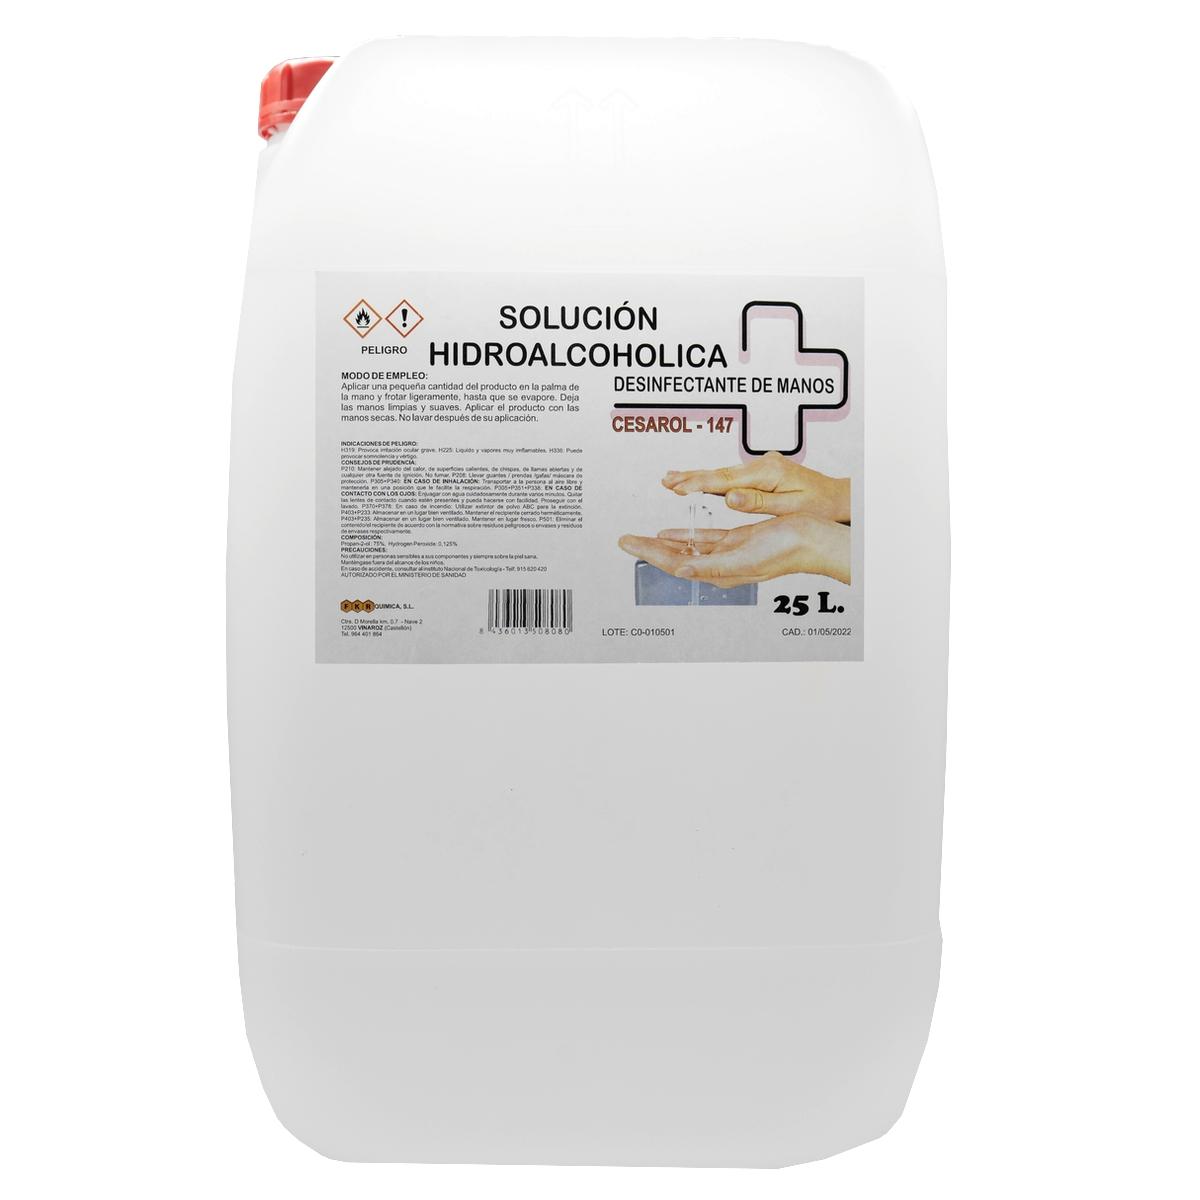 Desinfectante Solución Hidroalcoholica Cesarol-147 25L